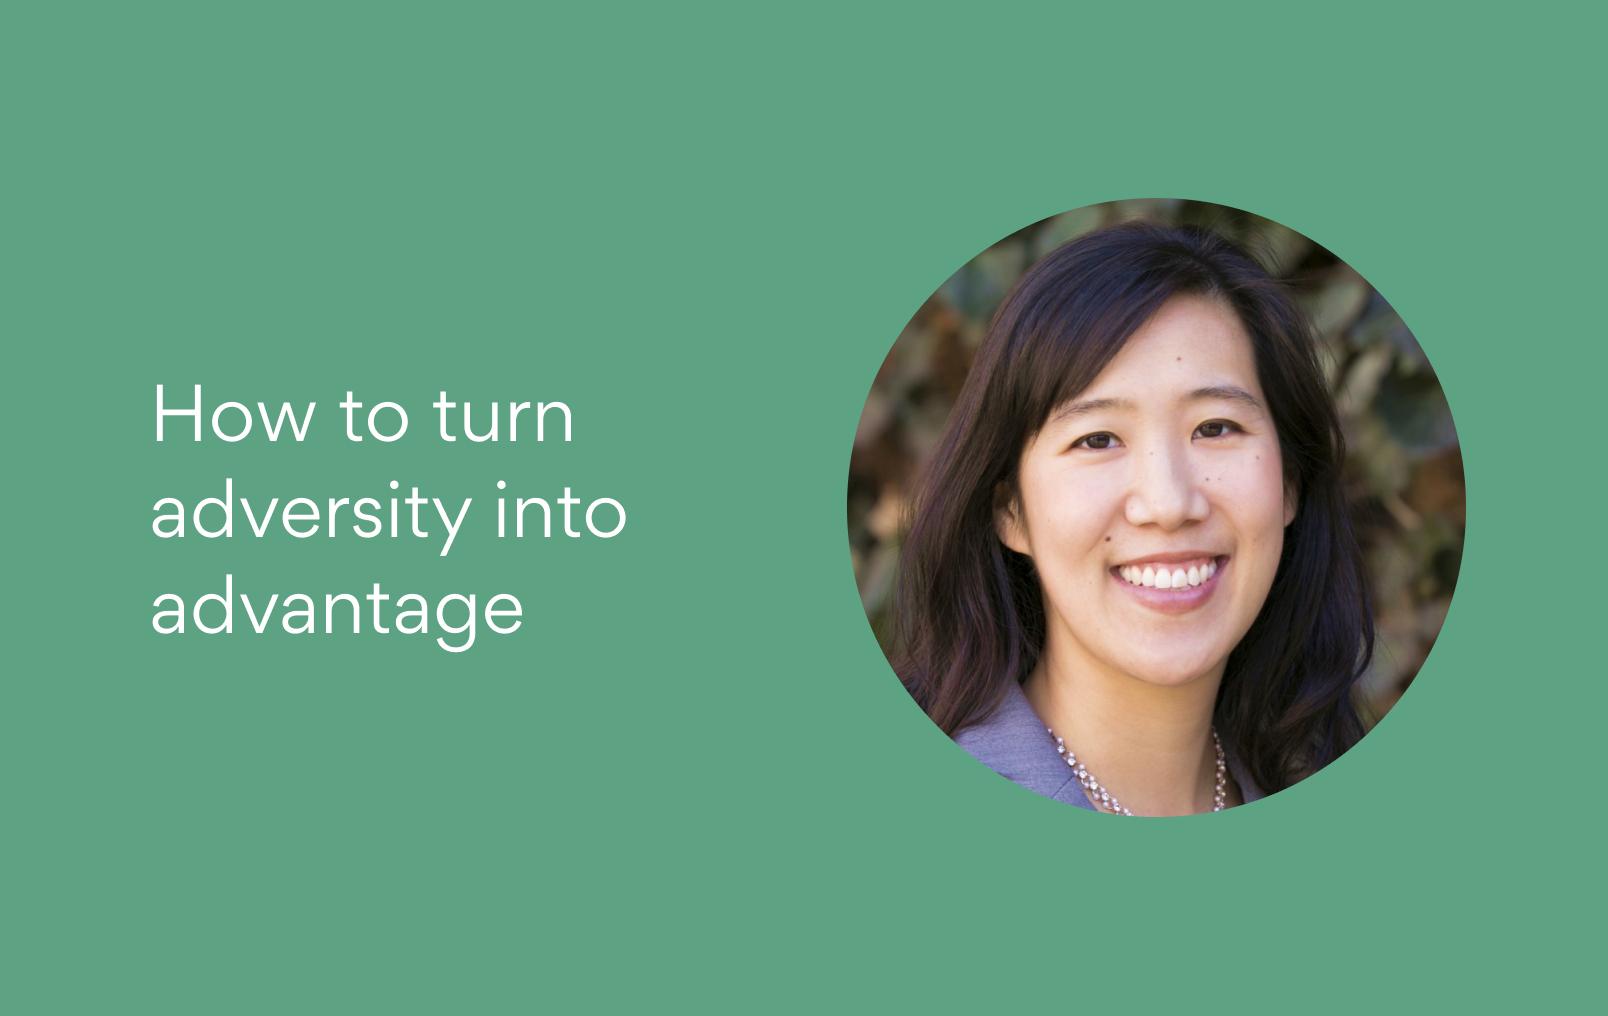 How to turn adversity into advantage: Tips from an award-winning Harvardprofessor